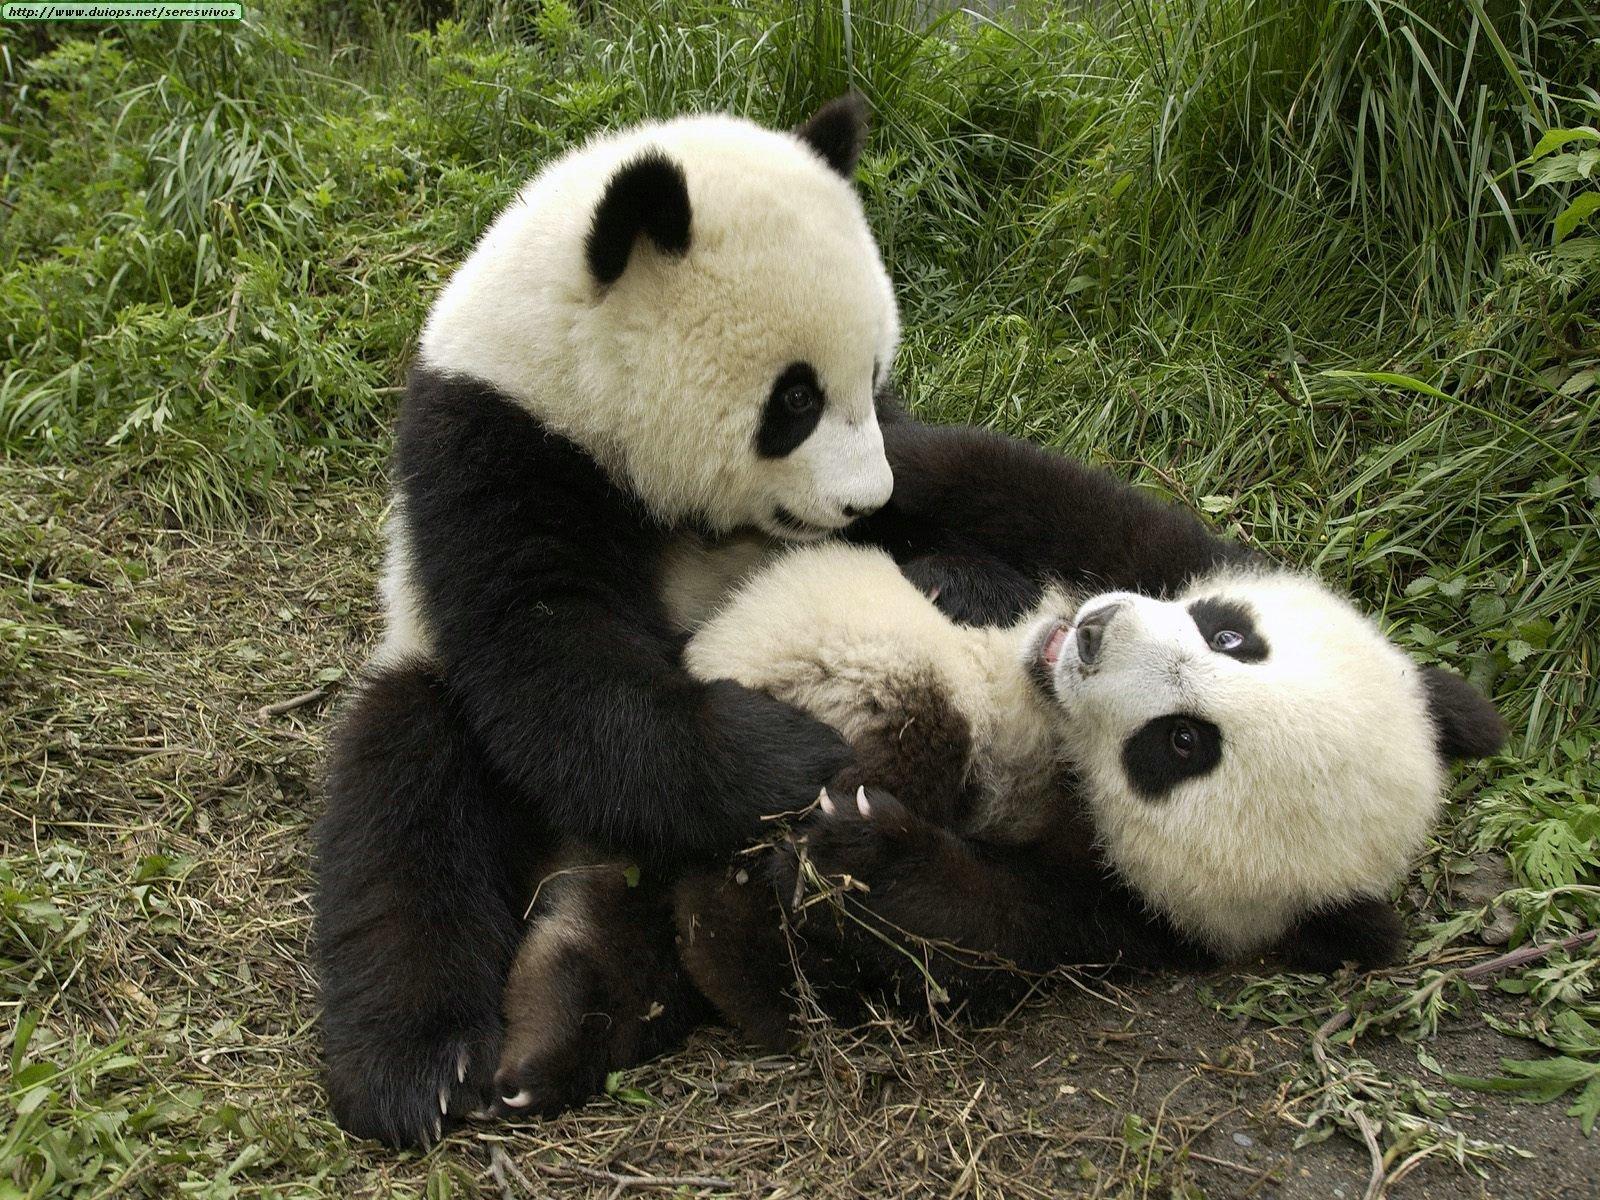 Animales, todas las especies Playful+Pandas